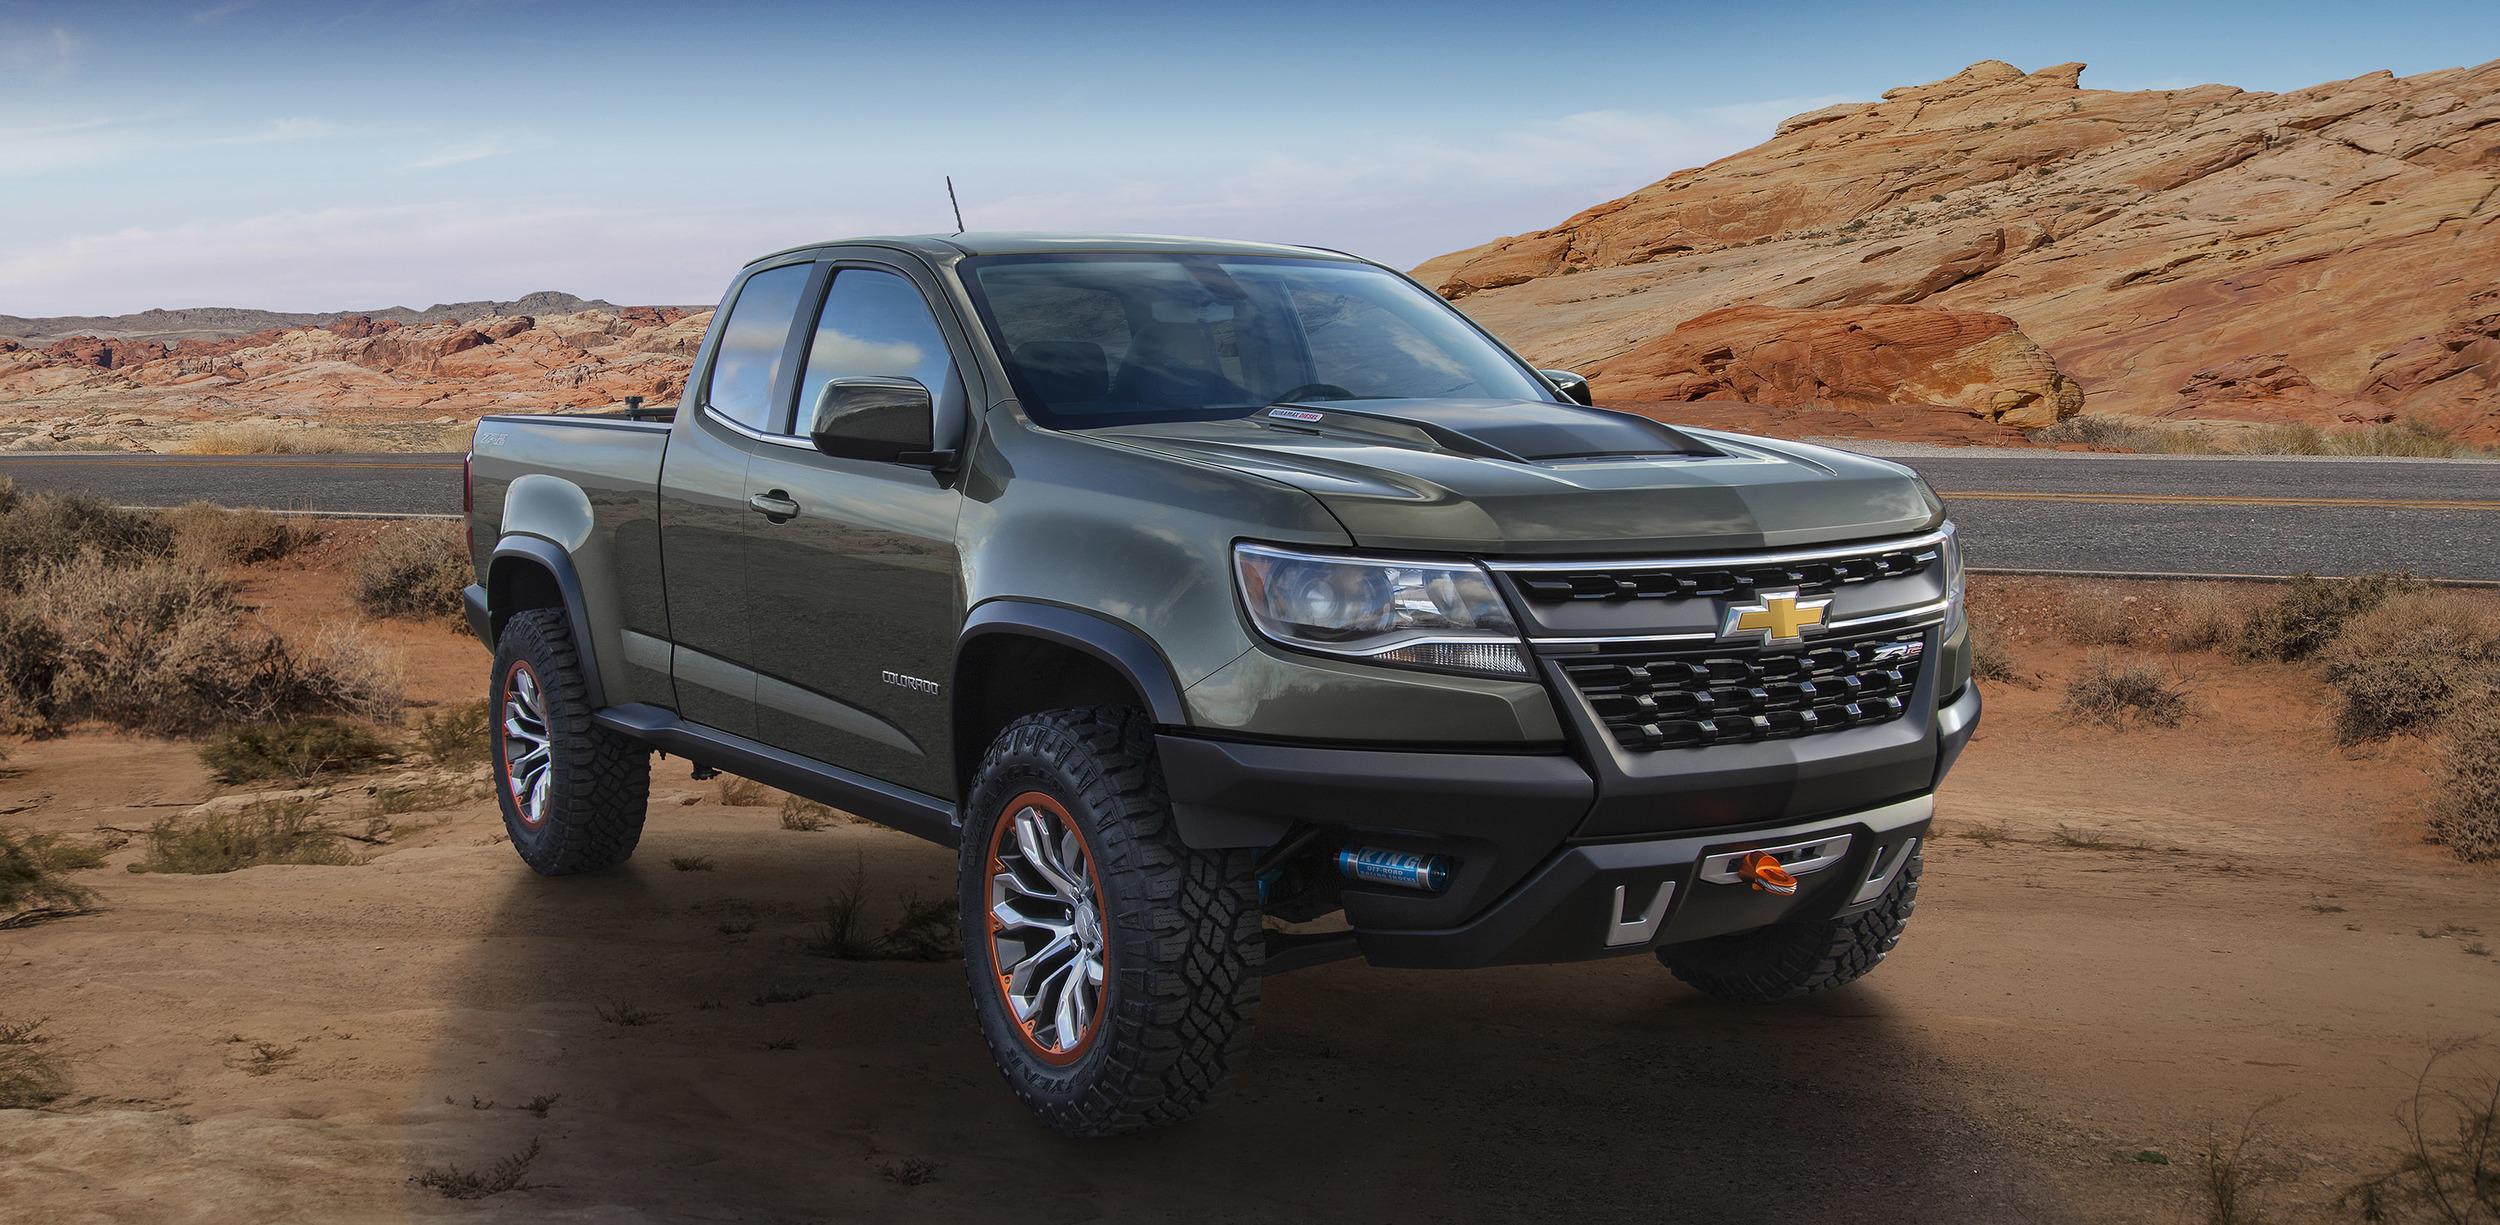 2015 Chevrolet Colorado ZR2 Concept Truck Rocks 2014 LA Auto Show